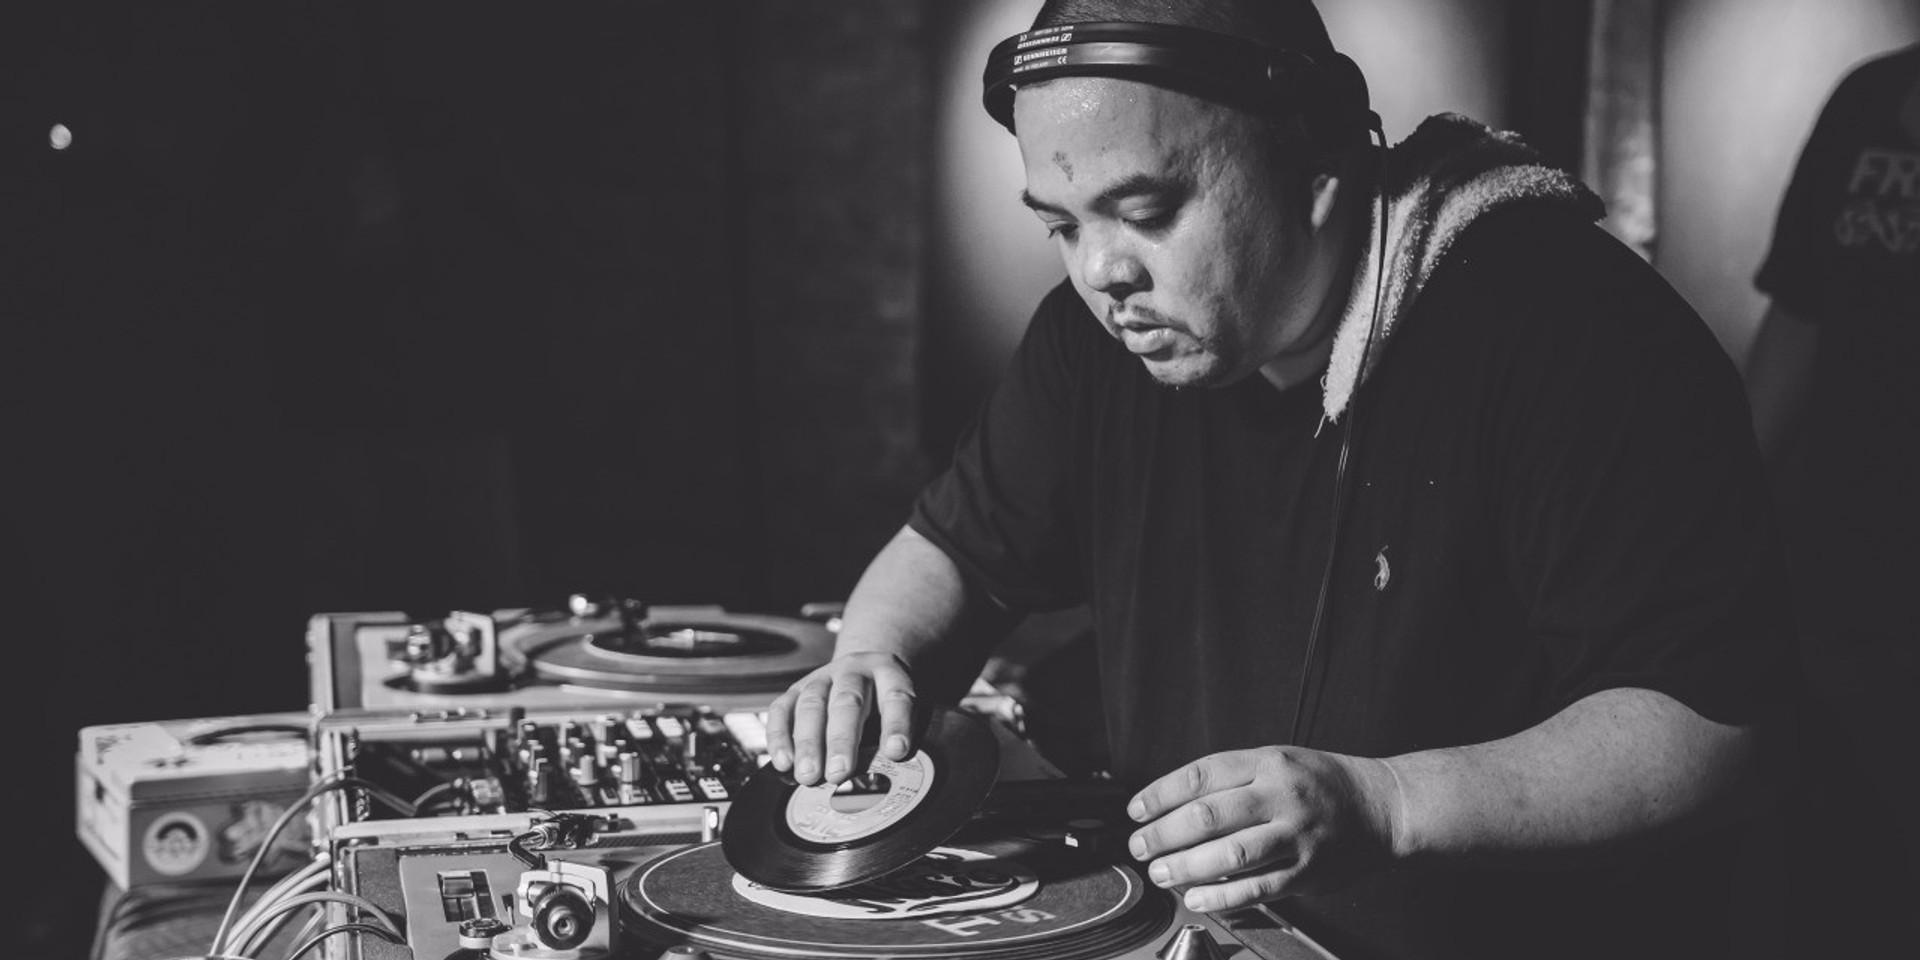 Hip-hop festival Summerdaze returns as a block party series, headlined by DJ Shortkut and Skratch Bastid